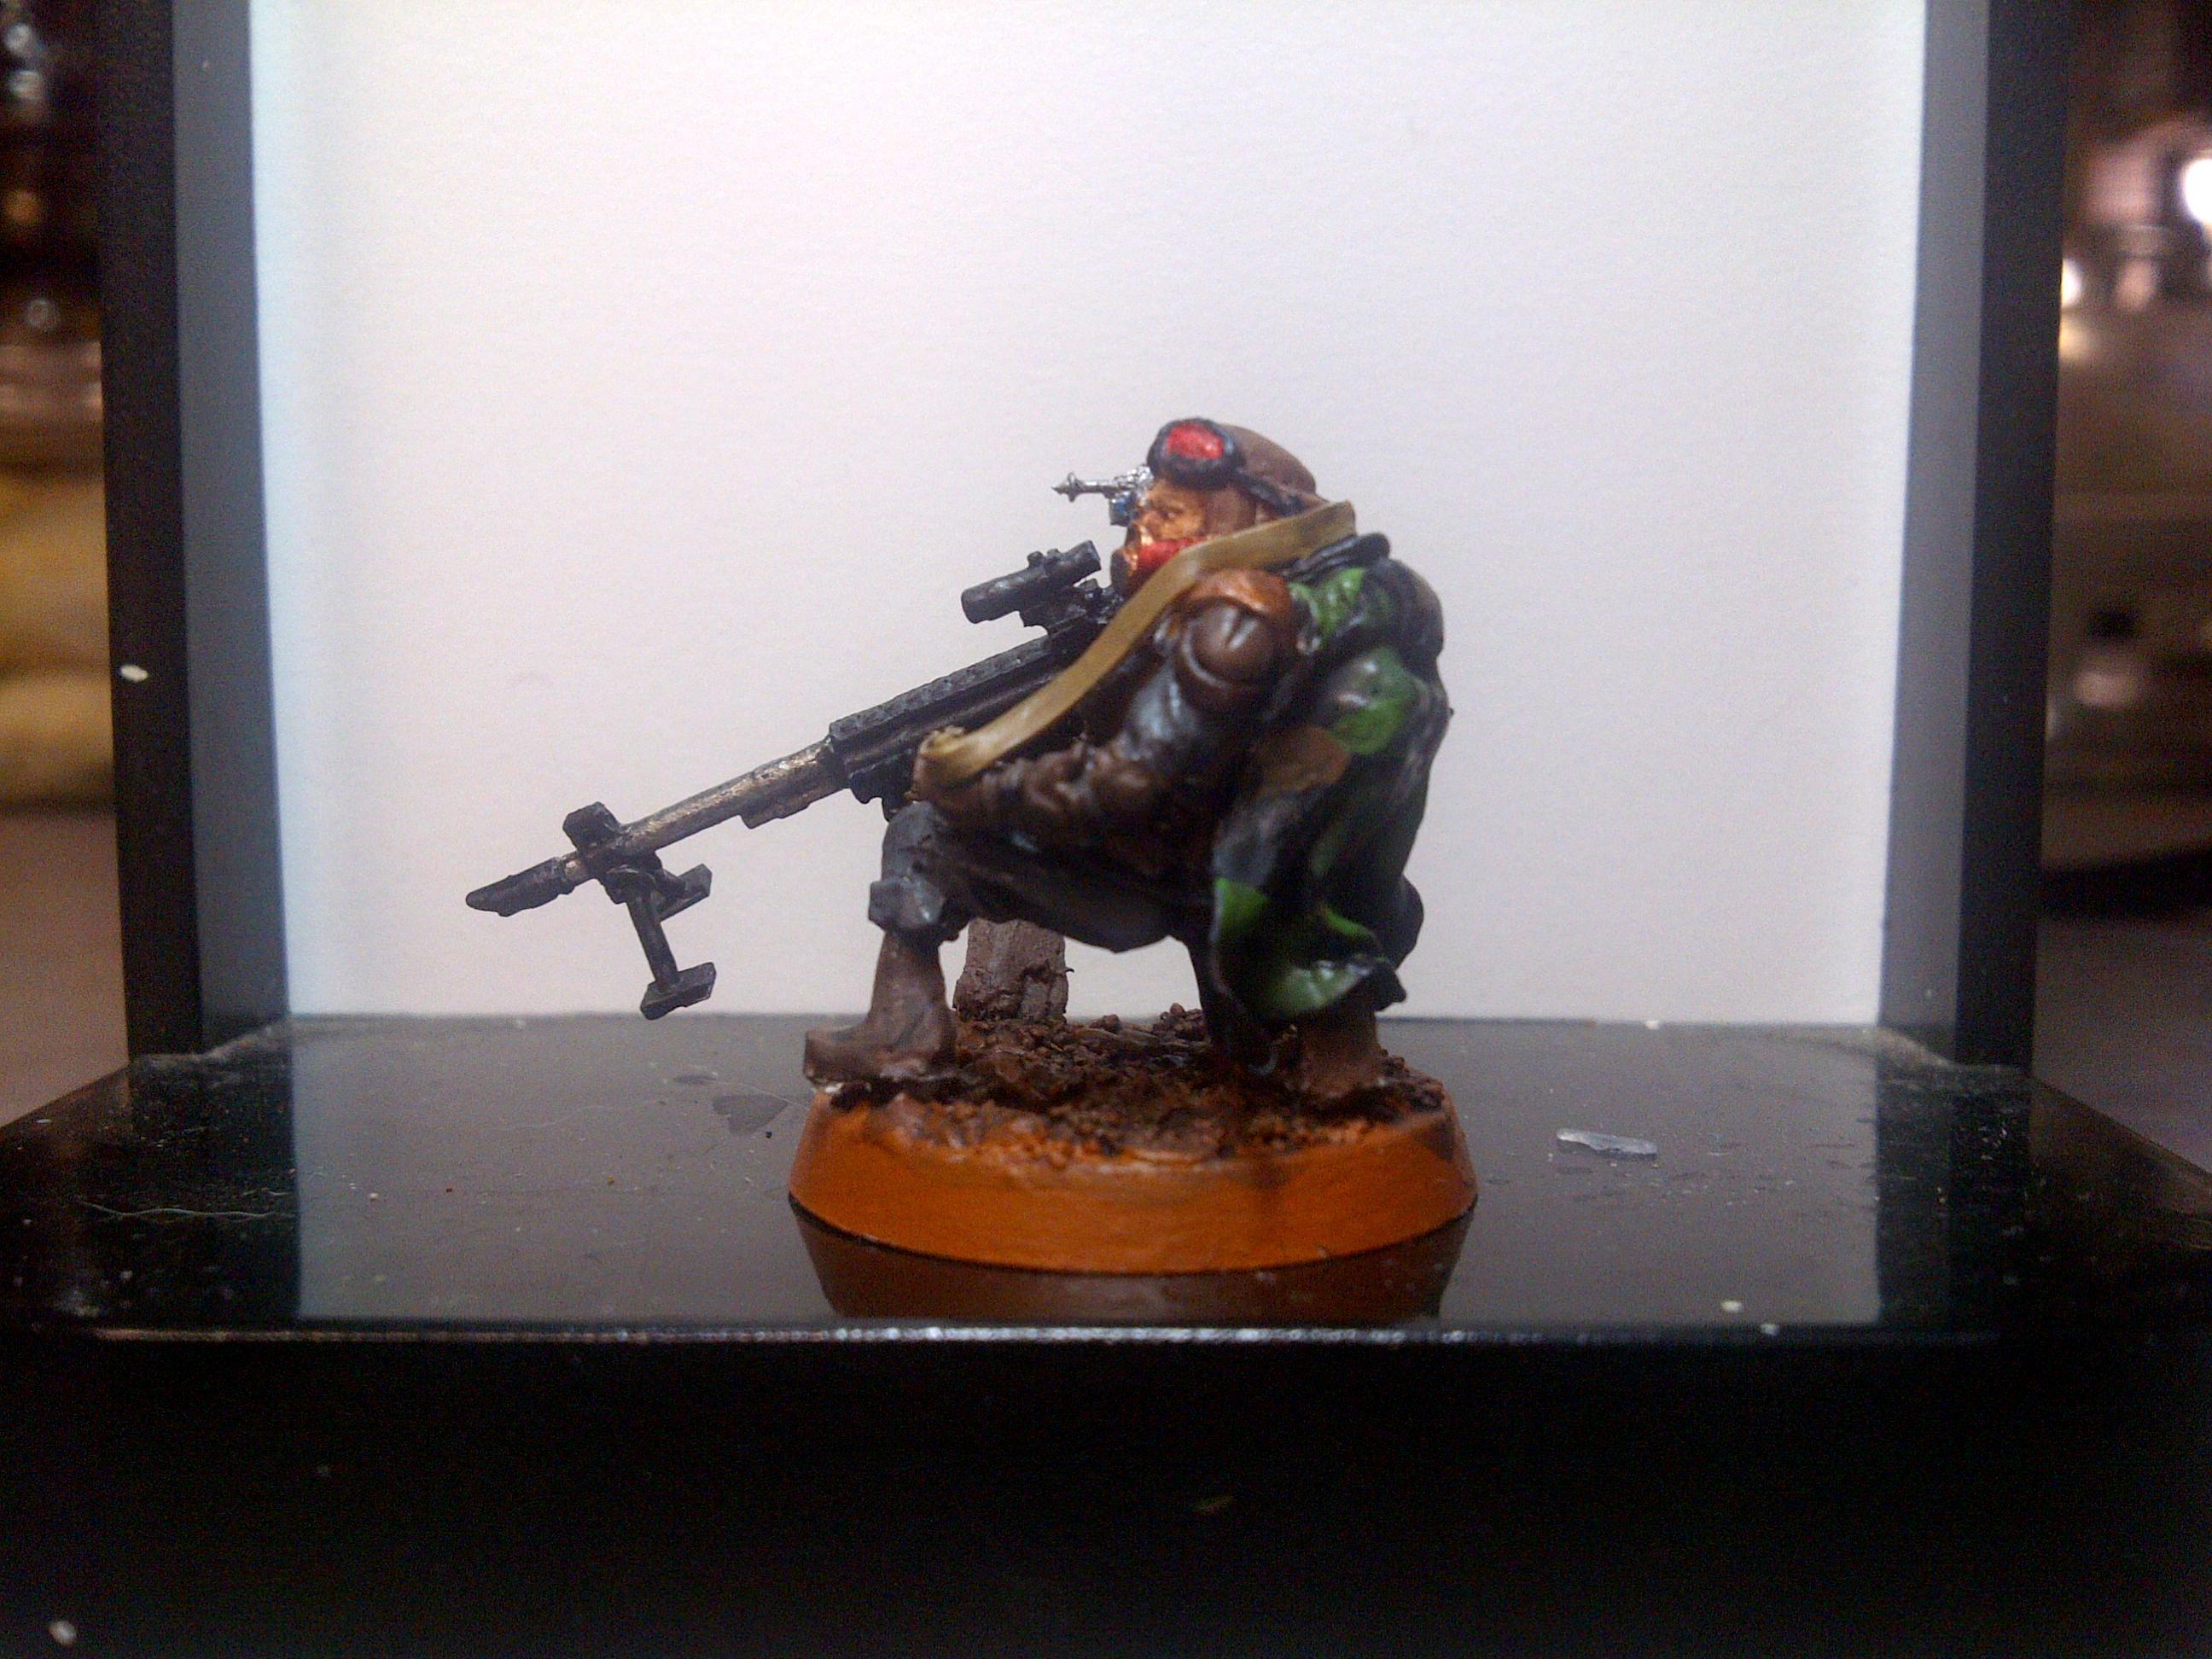 66th, Briggs, Chem-dogs, Guard, Imperial, Imperial Guard, Risha, Savlar, Snipers